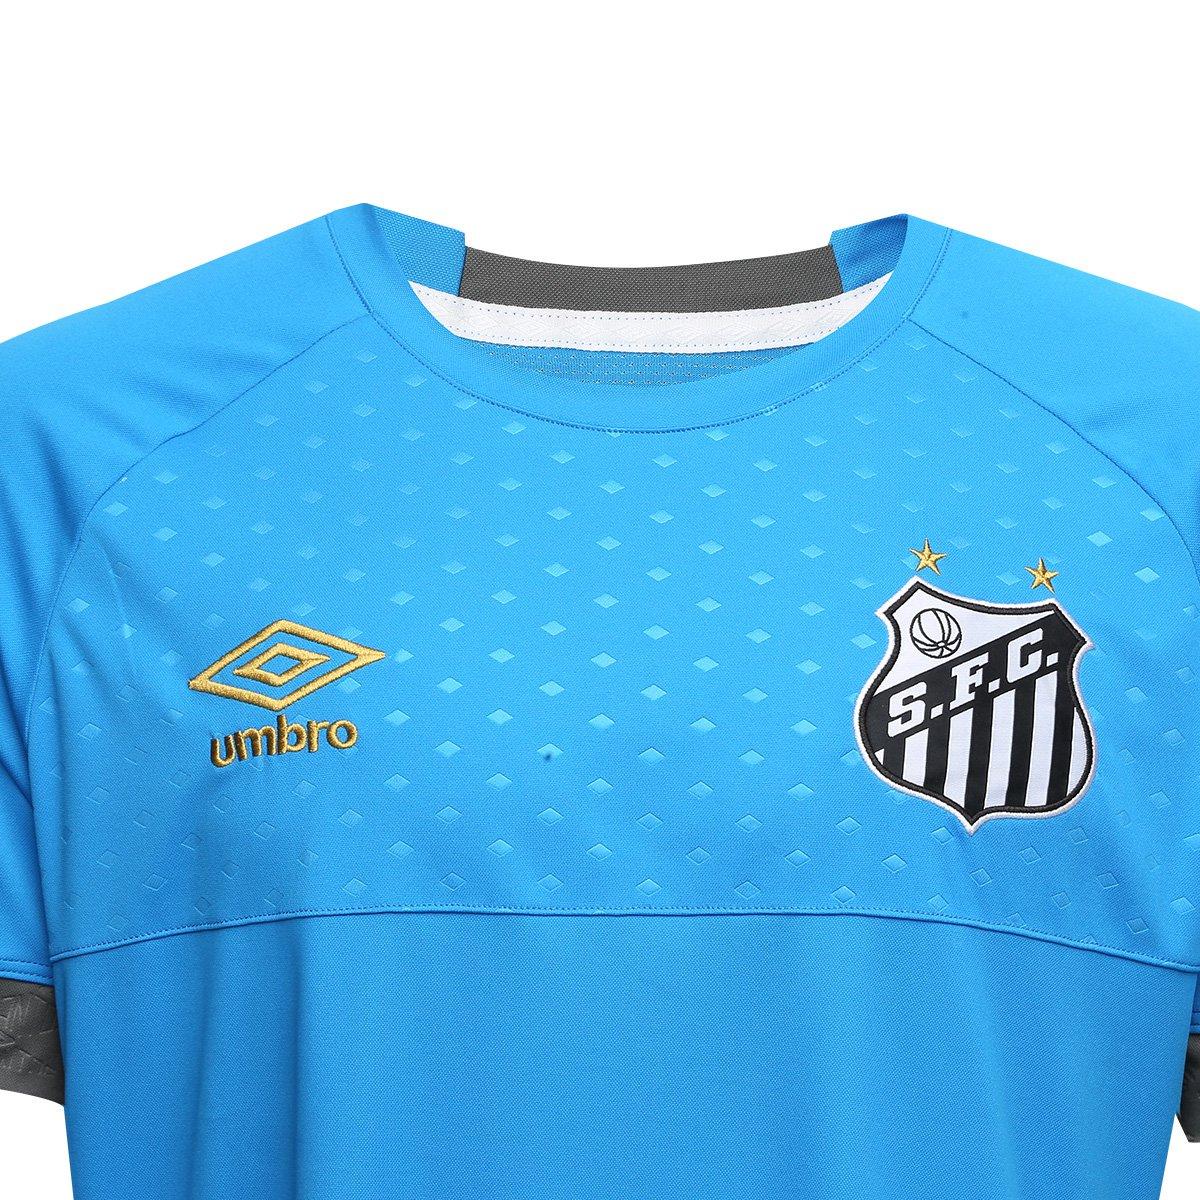 c14786b59f090 Camisa de Goleiro Santos I 2018 s n° Torcedor Umbro Masculina ...